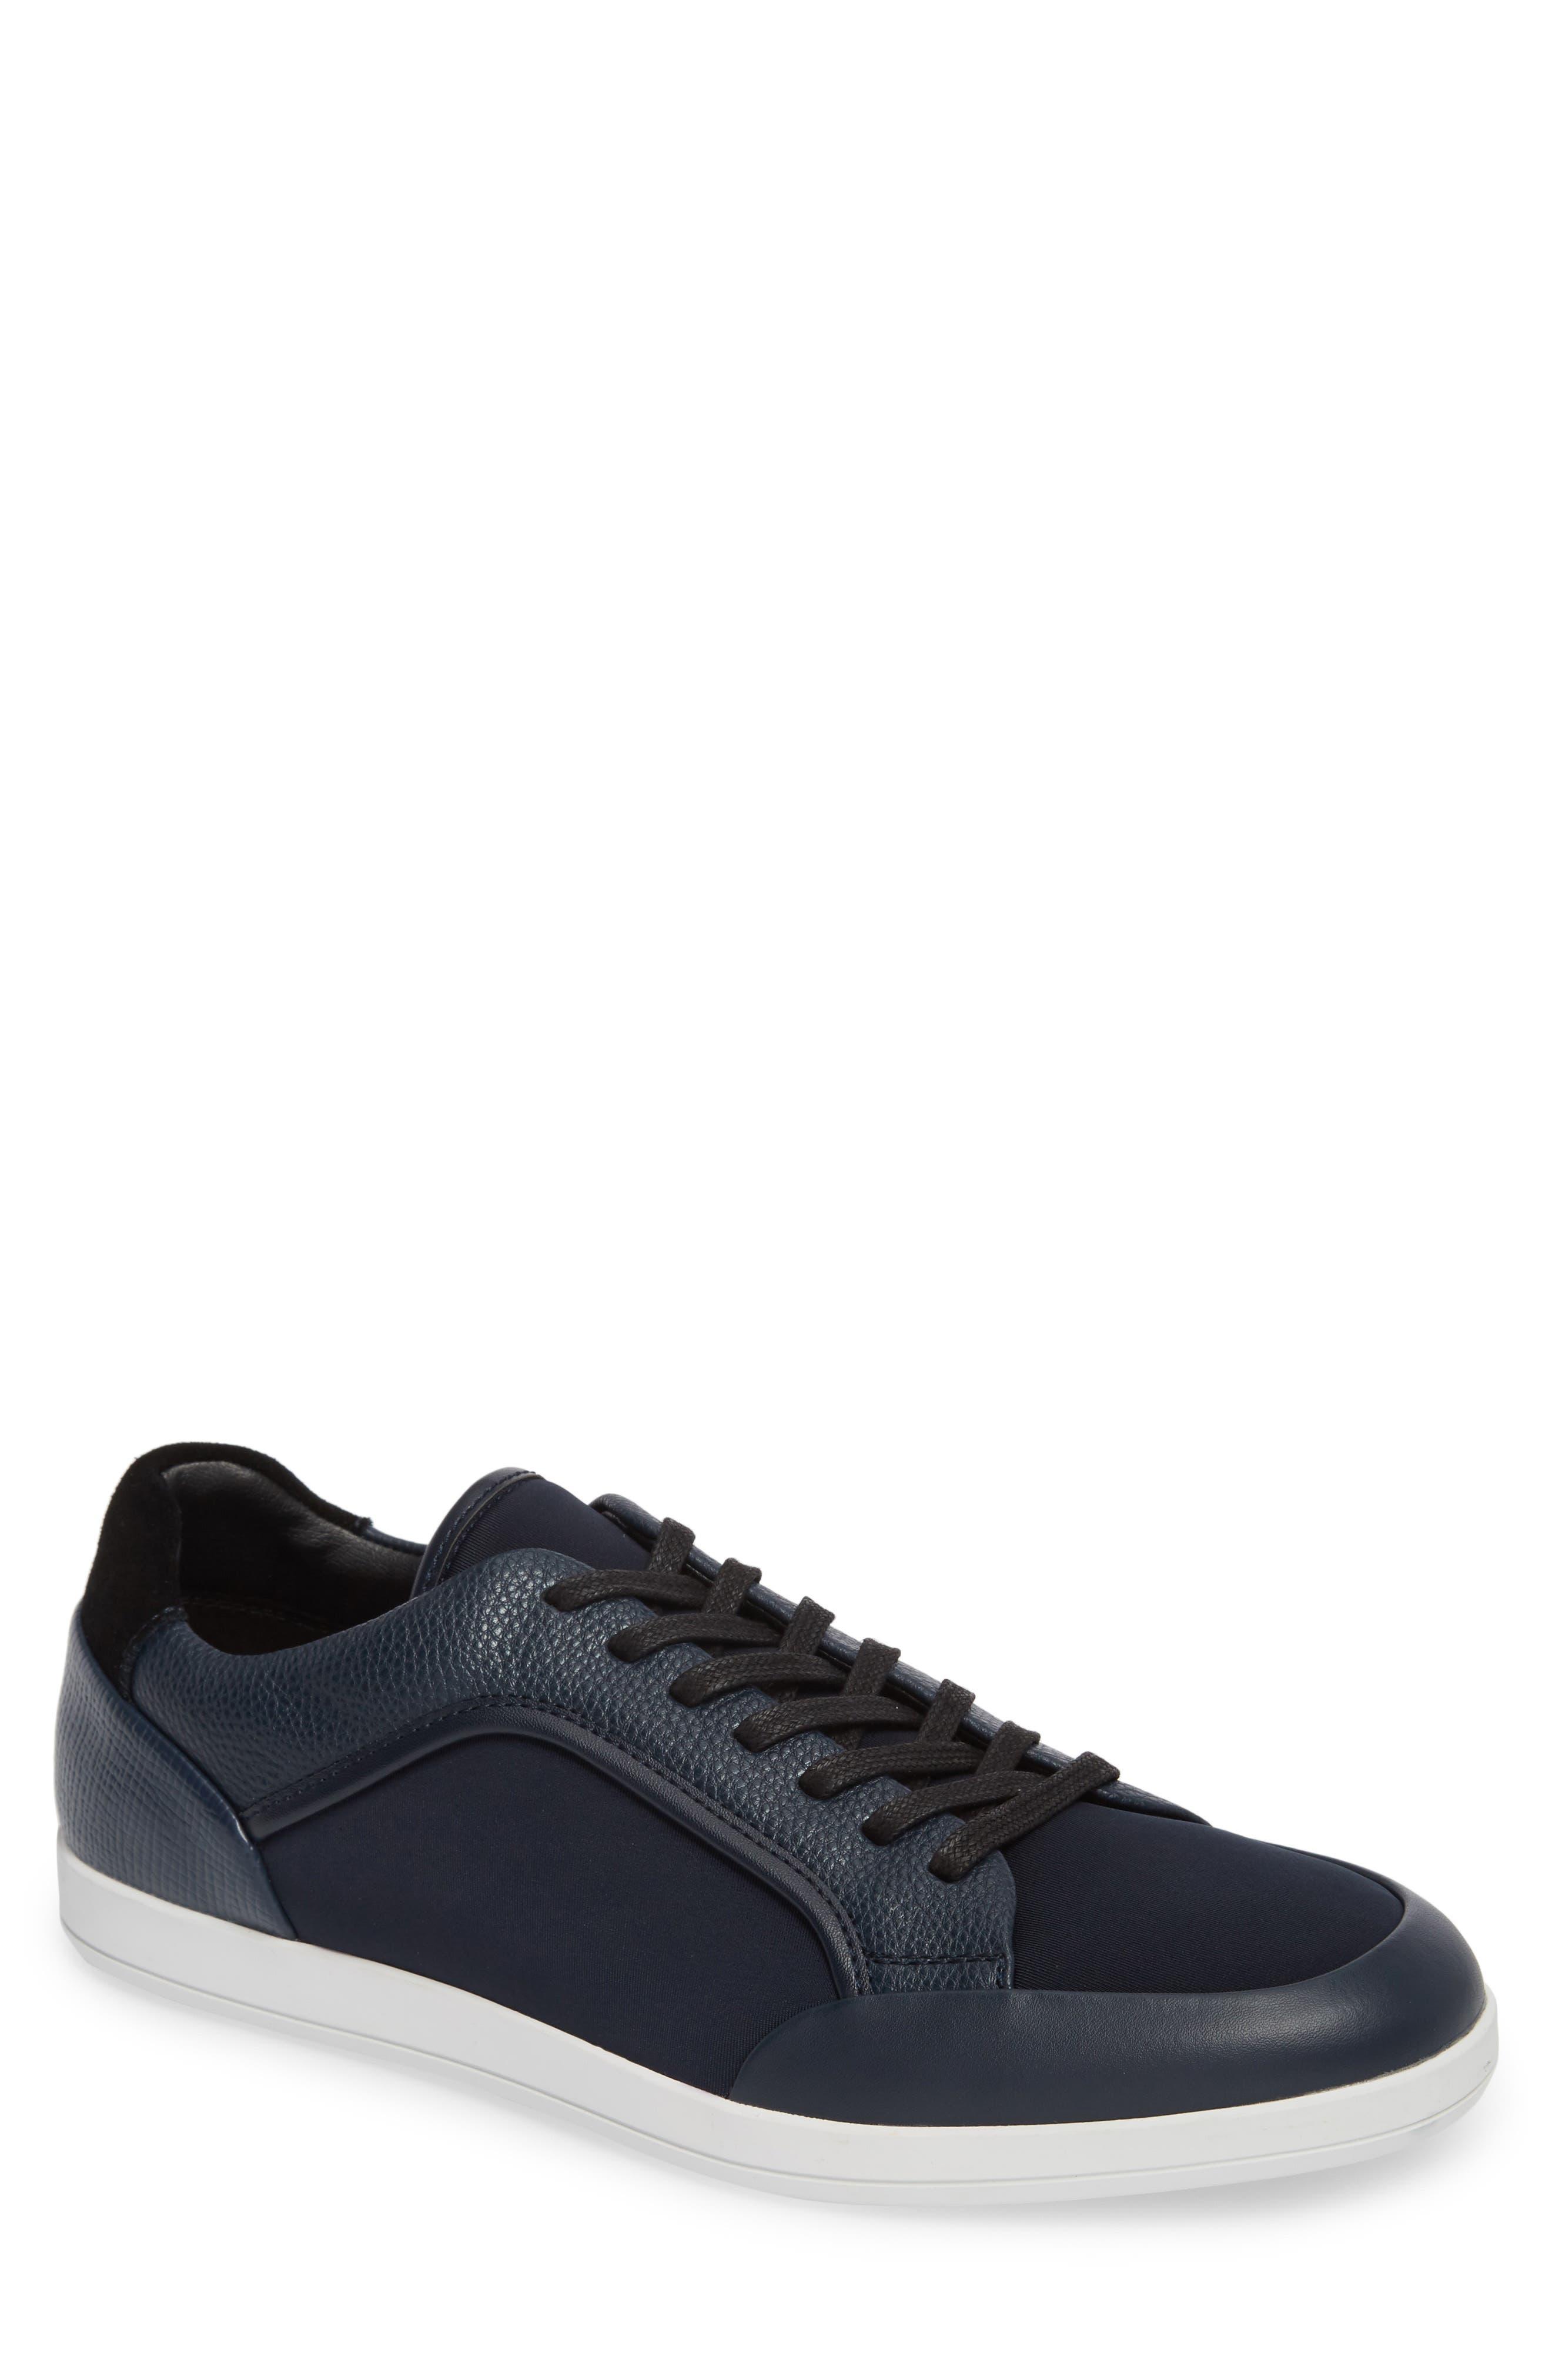 Masen Sneaker,                             Main thumbnail 1, color,                             Dark Navy Lyrcra